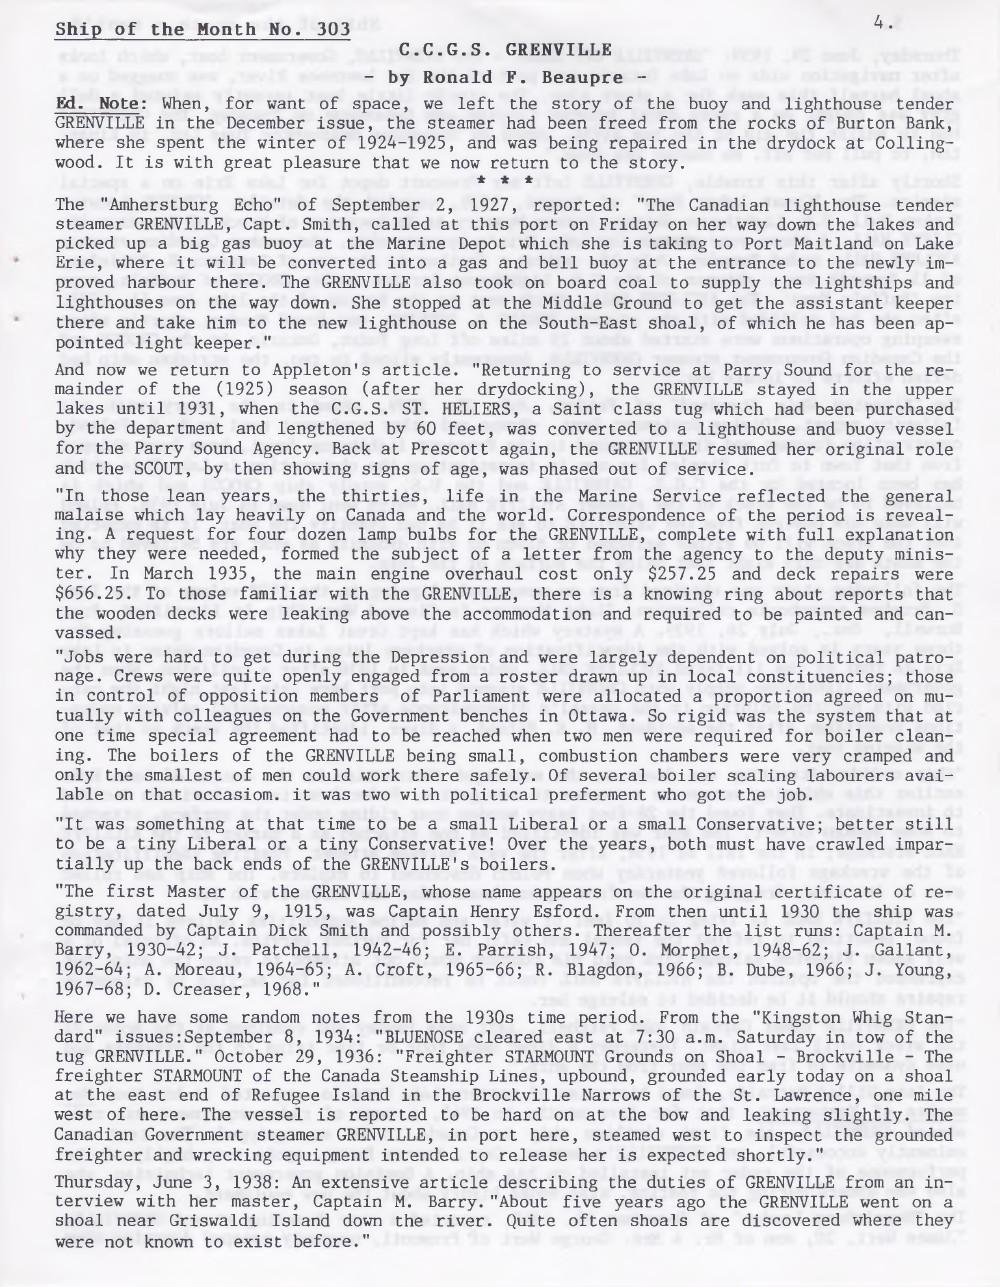 Scanner, v. 39, no. 3 (January 2007)